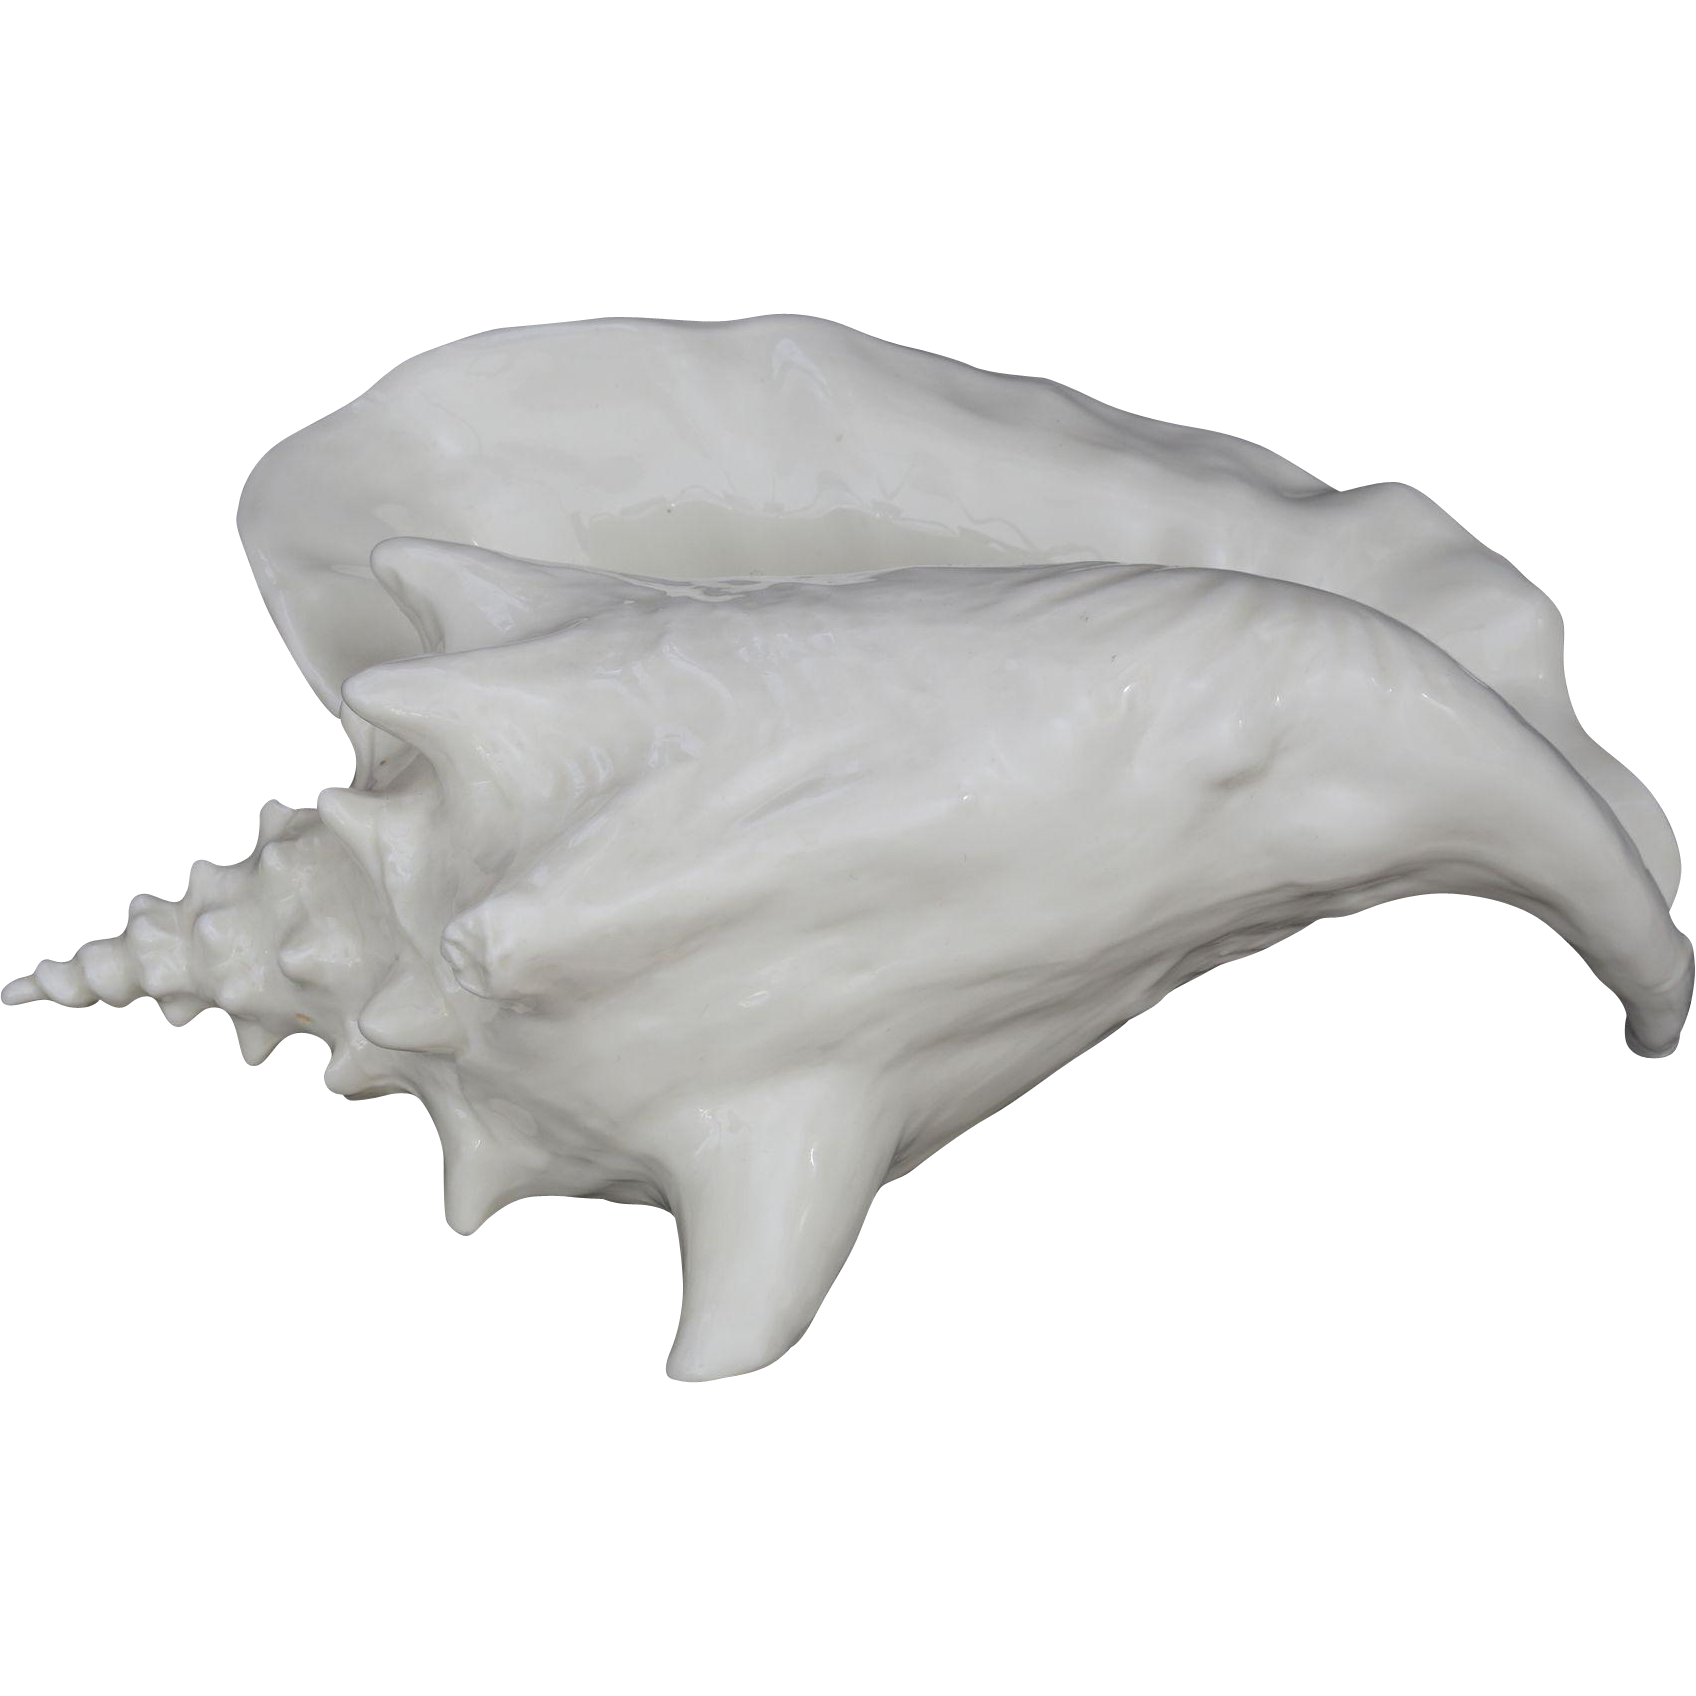 Royal Worcester Bermudan Shell Figurine Model 3545 Ronald van Ruyckevelt - 1955, England